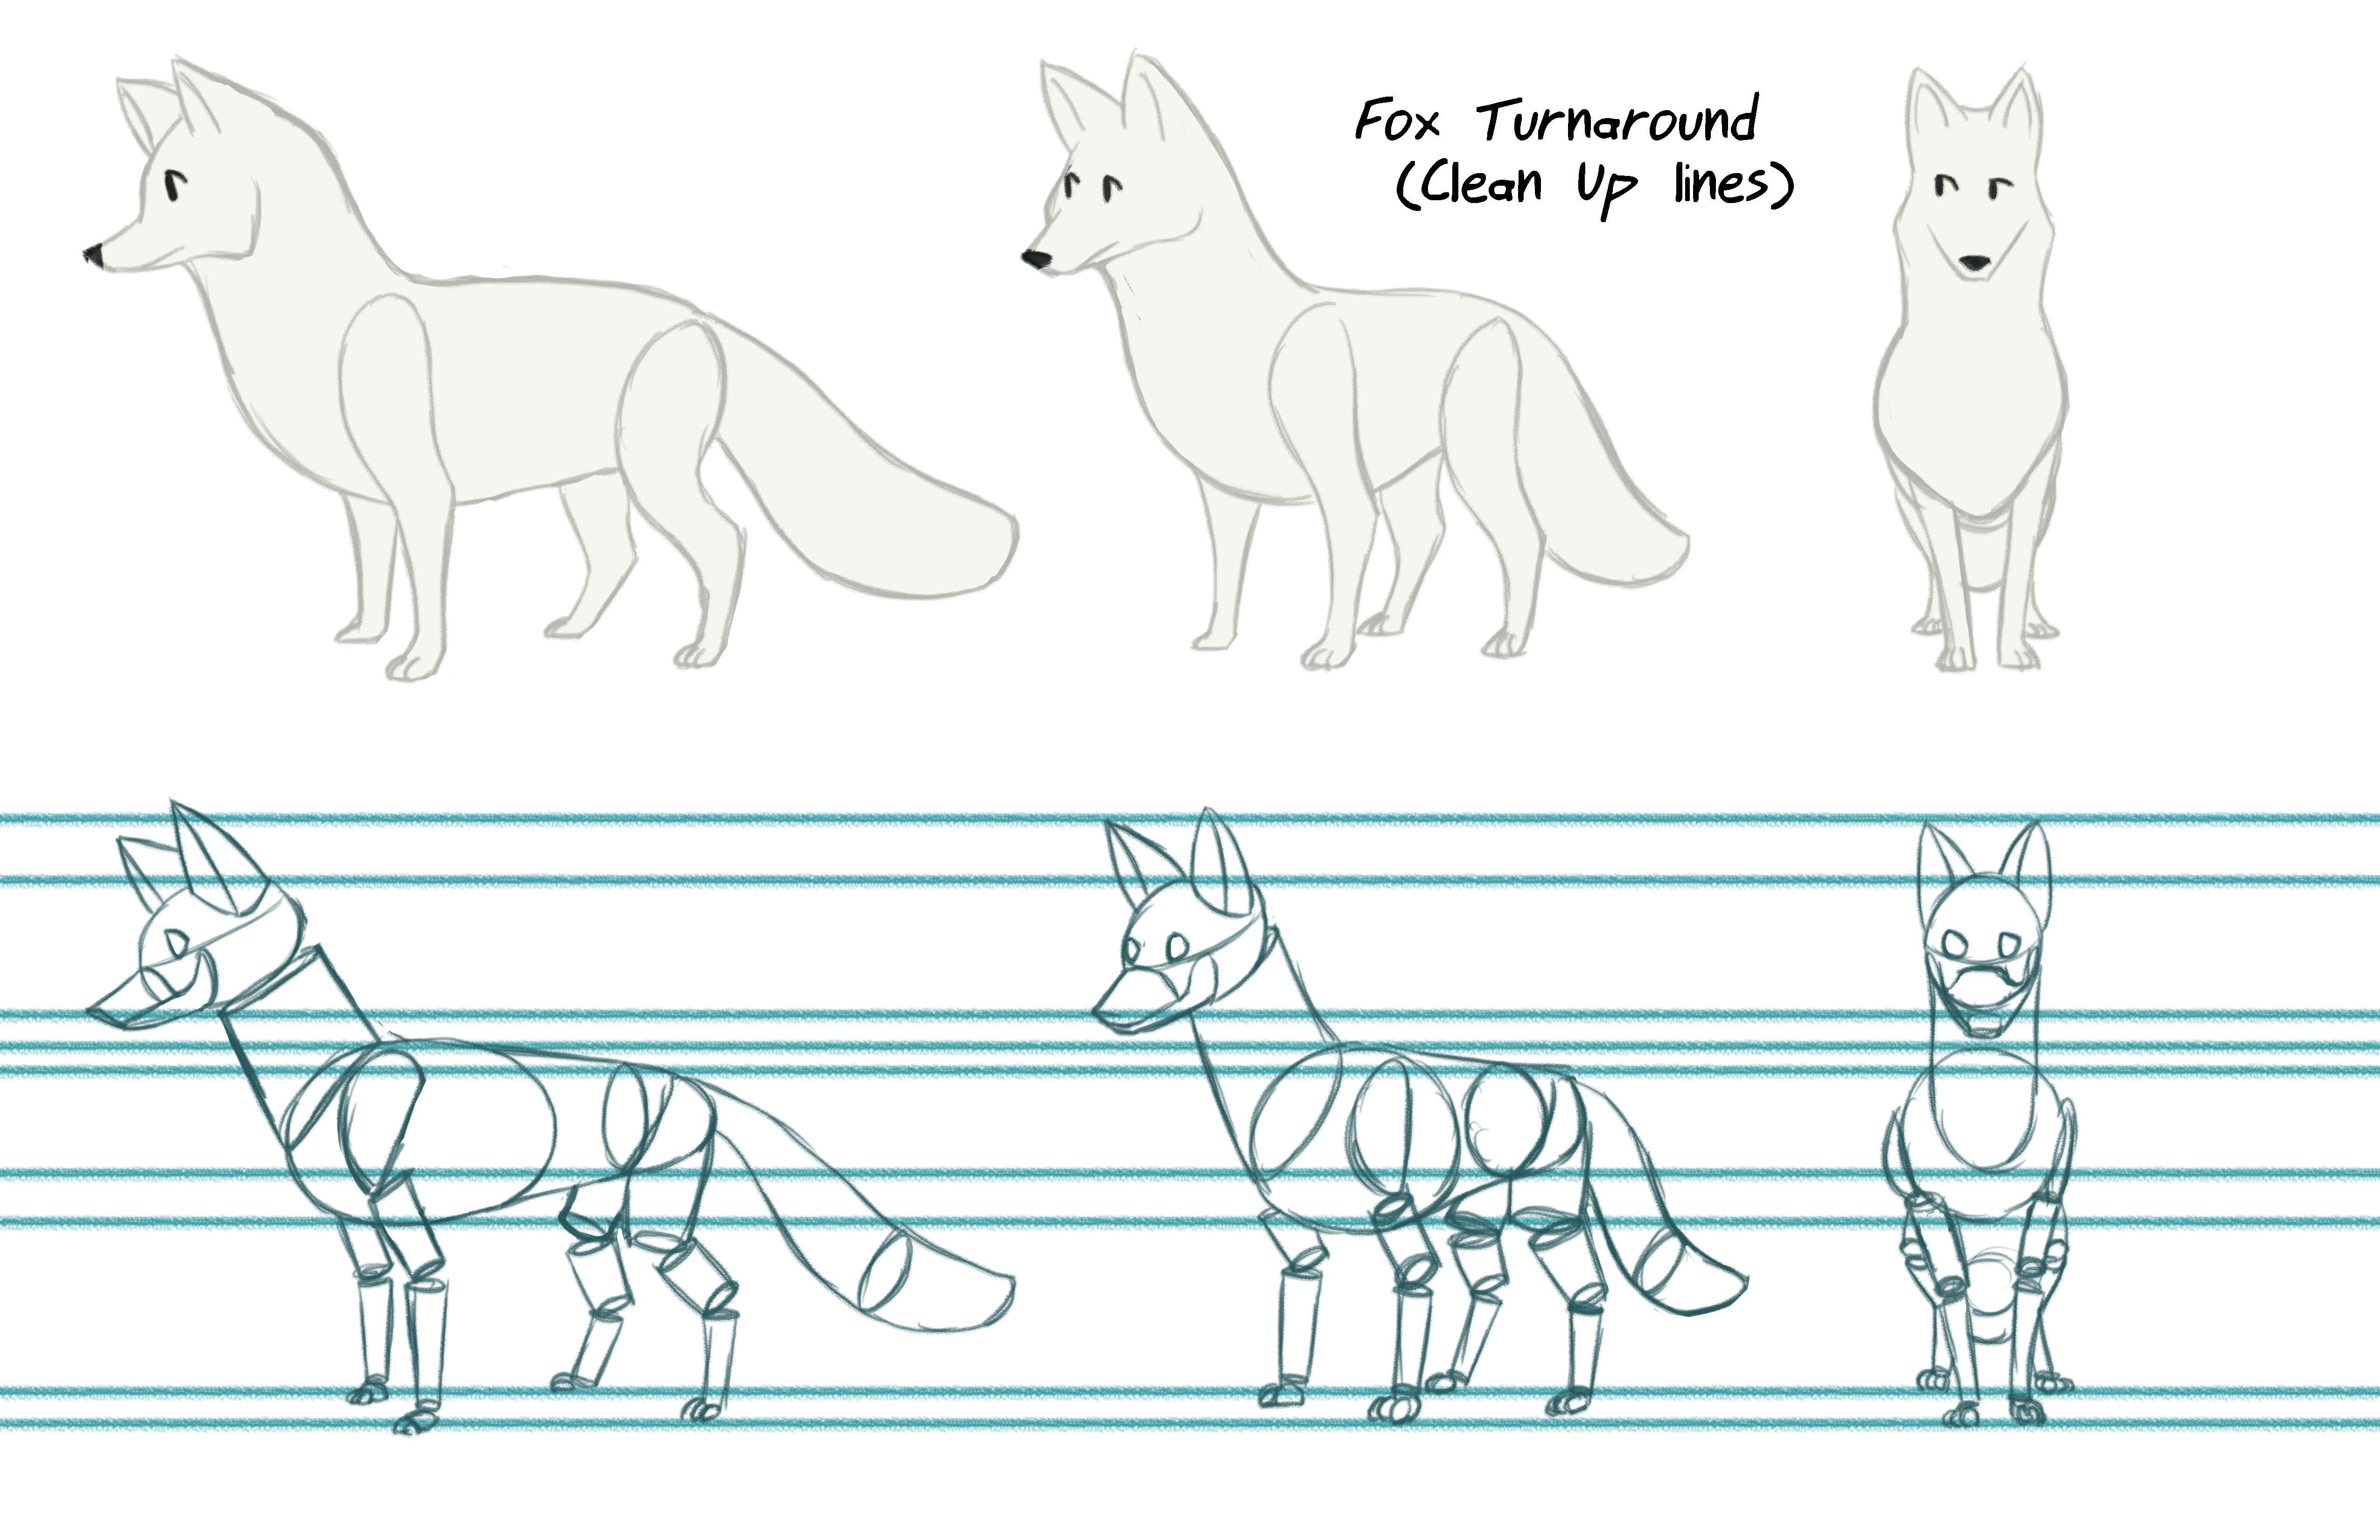 fox turnaround